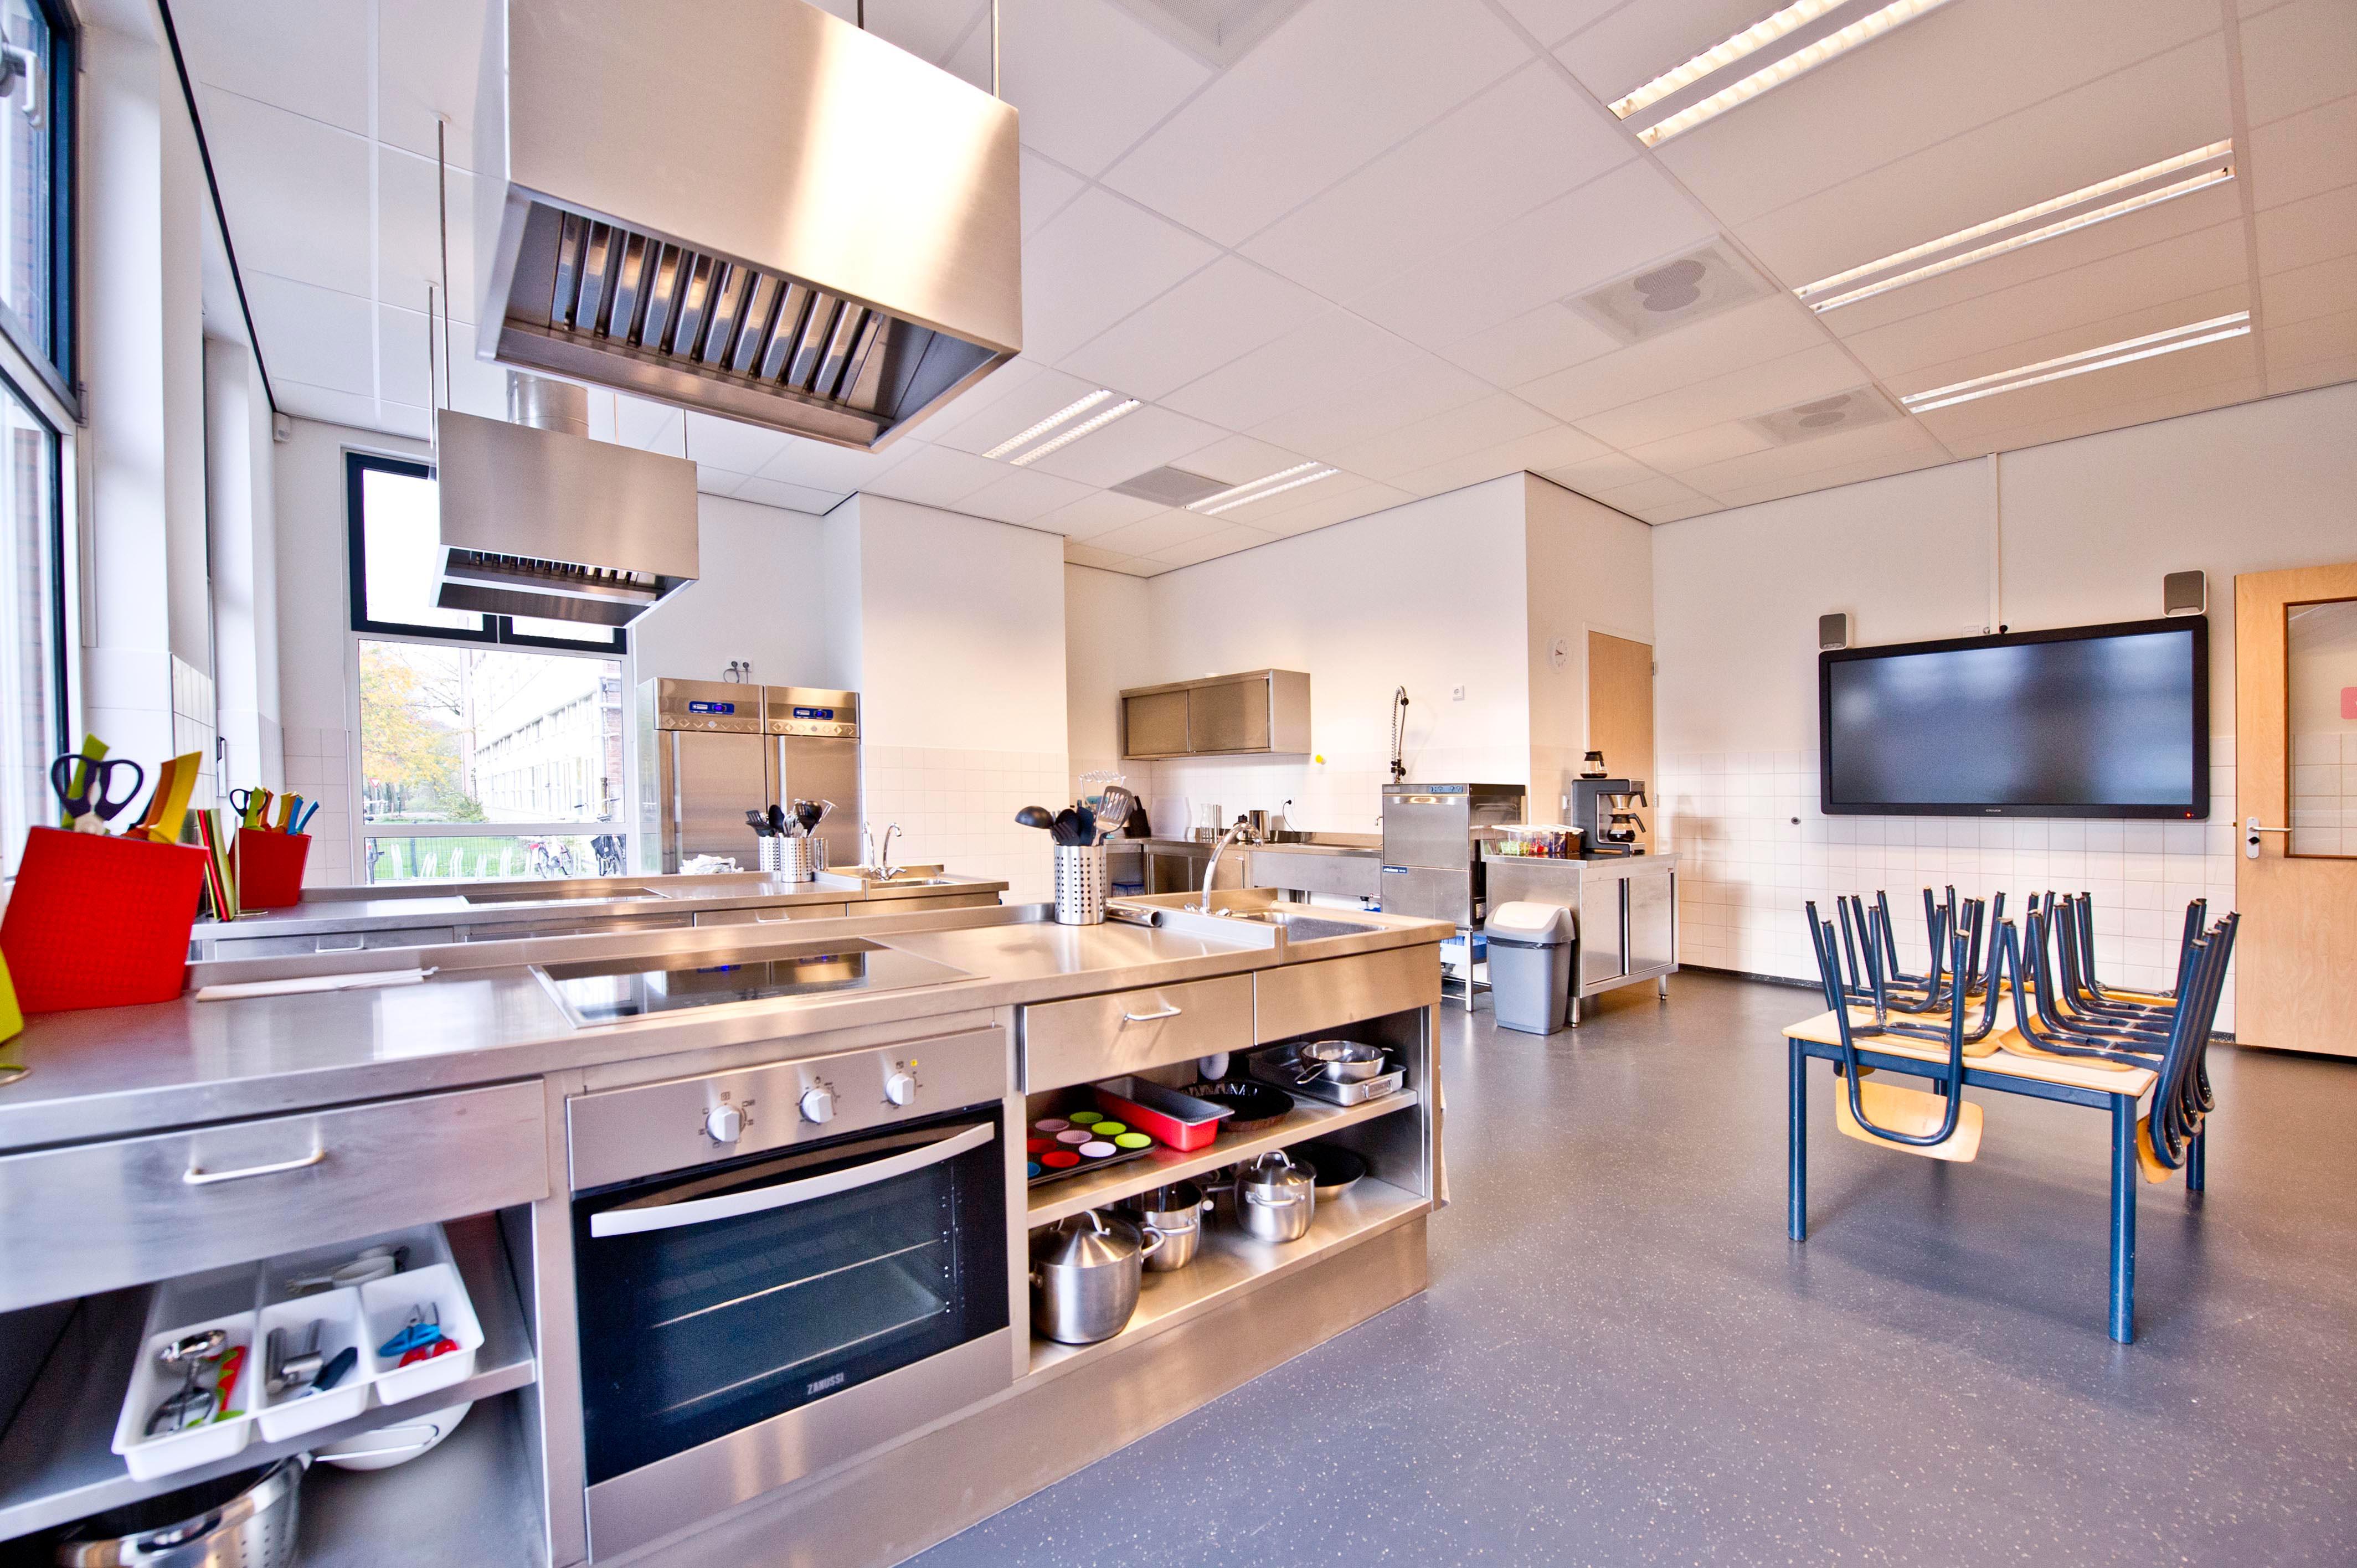 keuken lokaal nieuwbouw school KREUK architectuur